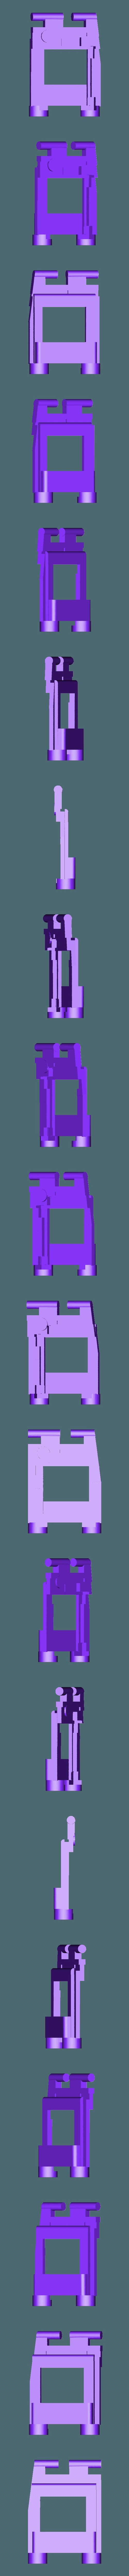 hireSV6.stl Download free STL file Small Humanoid Robot • 3D printable design, choimoni